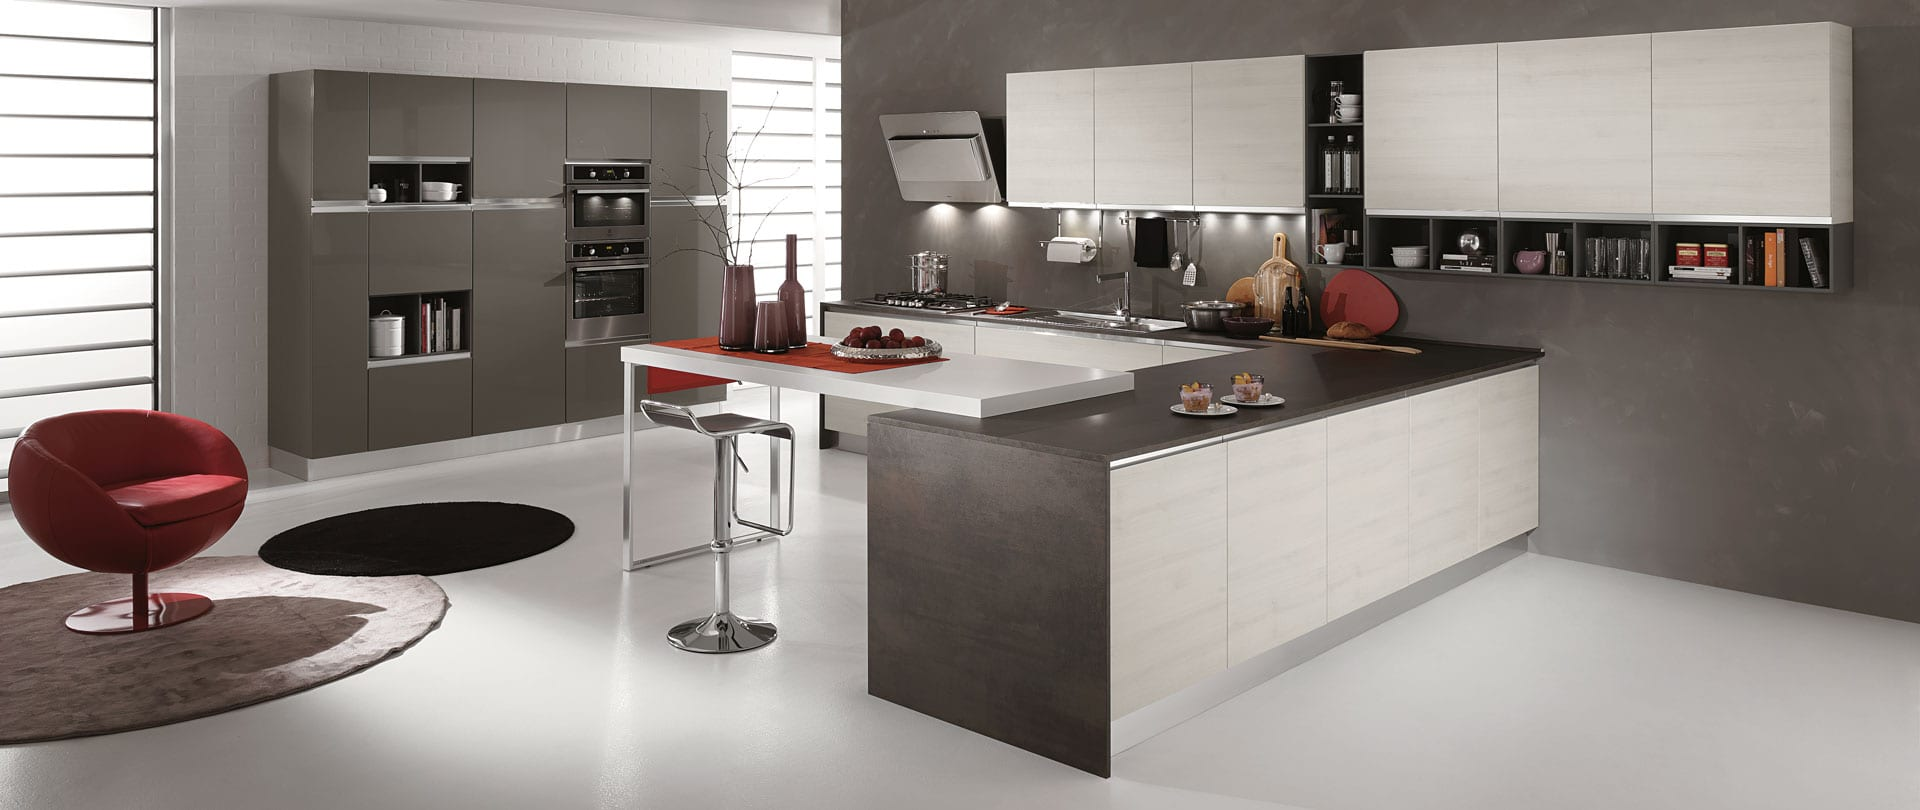 01-cucina-moderna-newmeg-tranche-ghiaccio-grigio-polvere